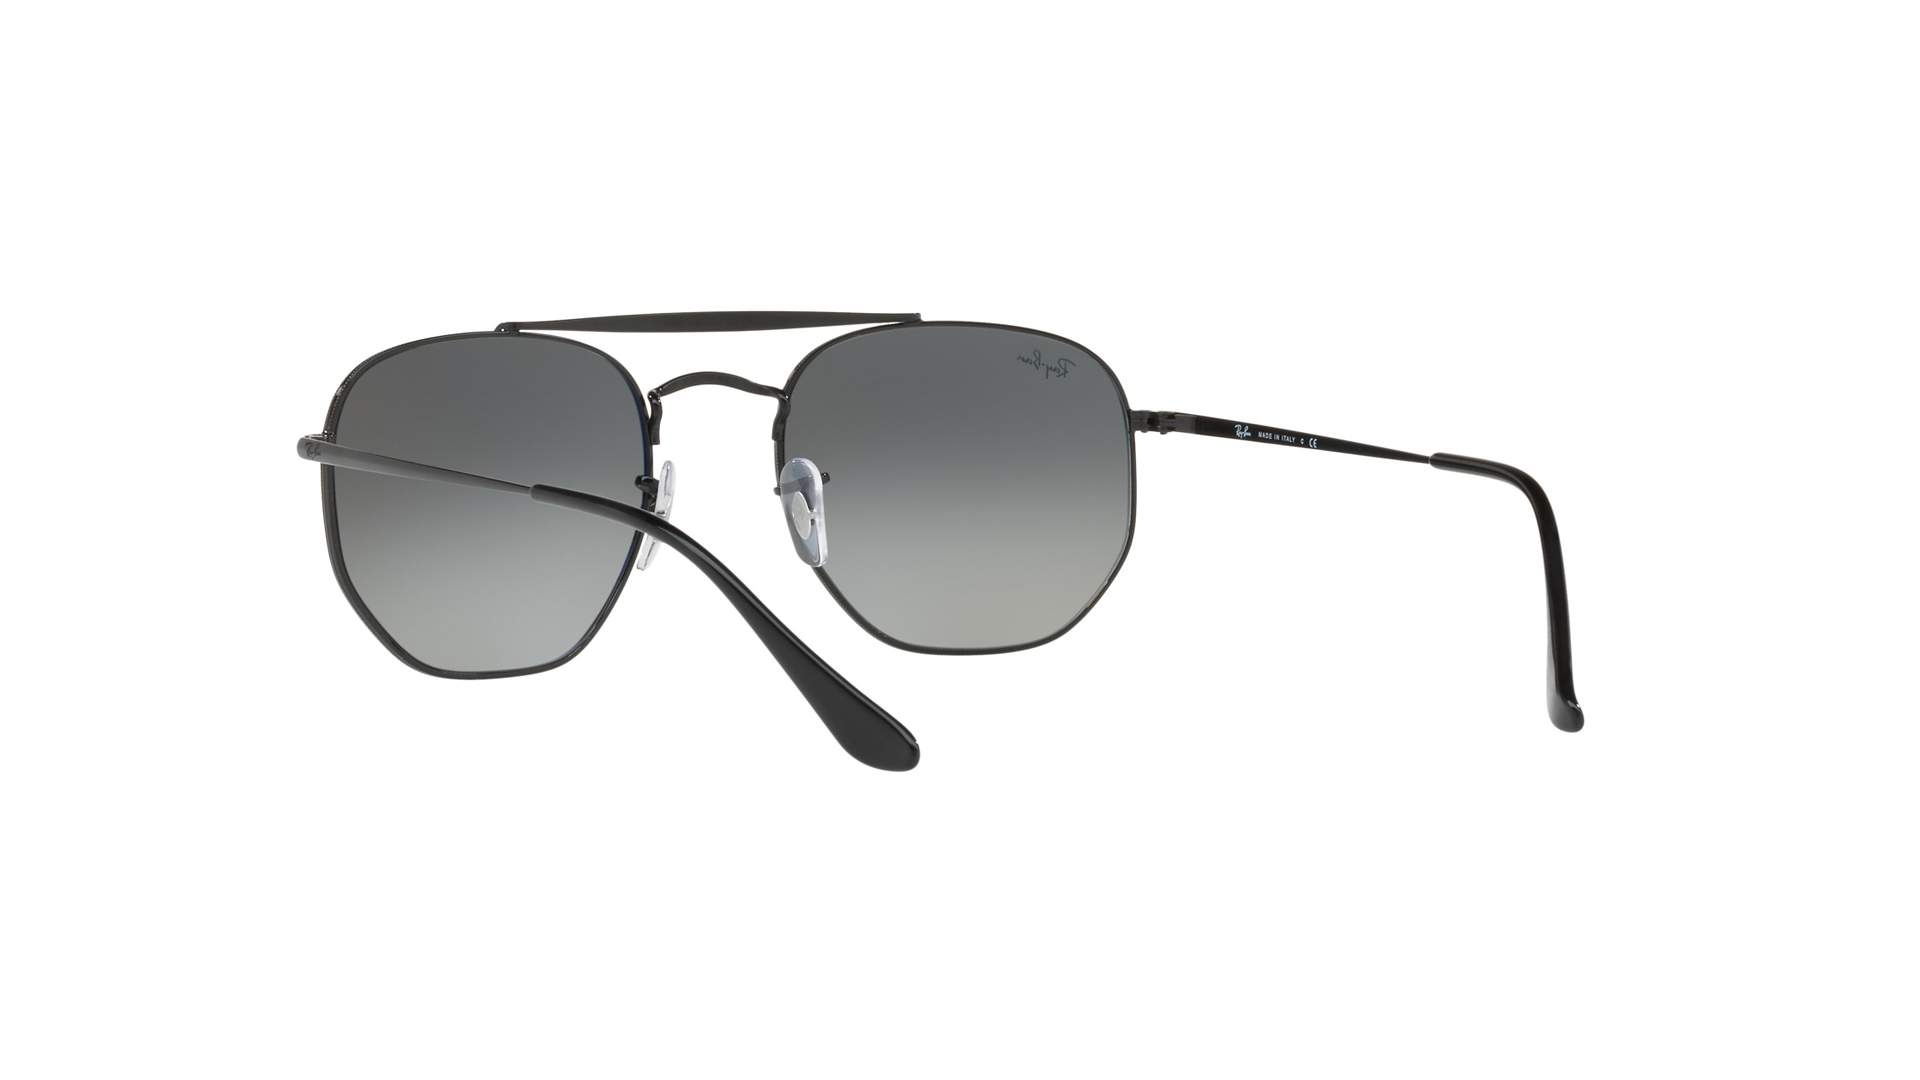 cac7232e46 Sunglasses Ray-Ban Marshal Black RB3648 002 71 51-21 Medium Gradient